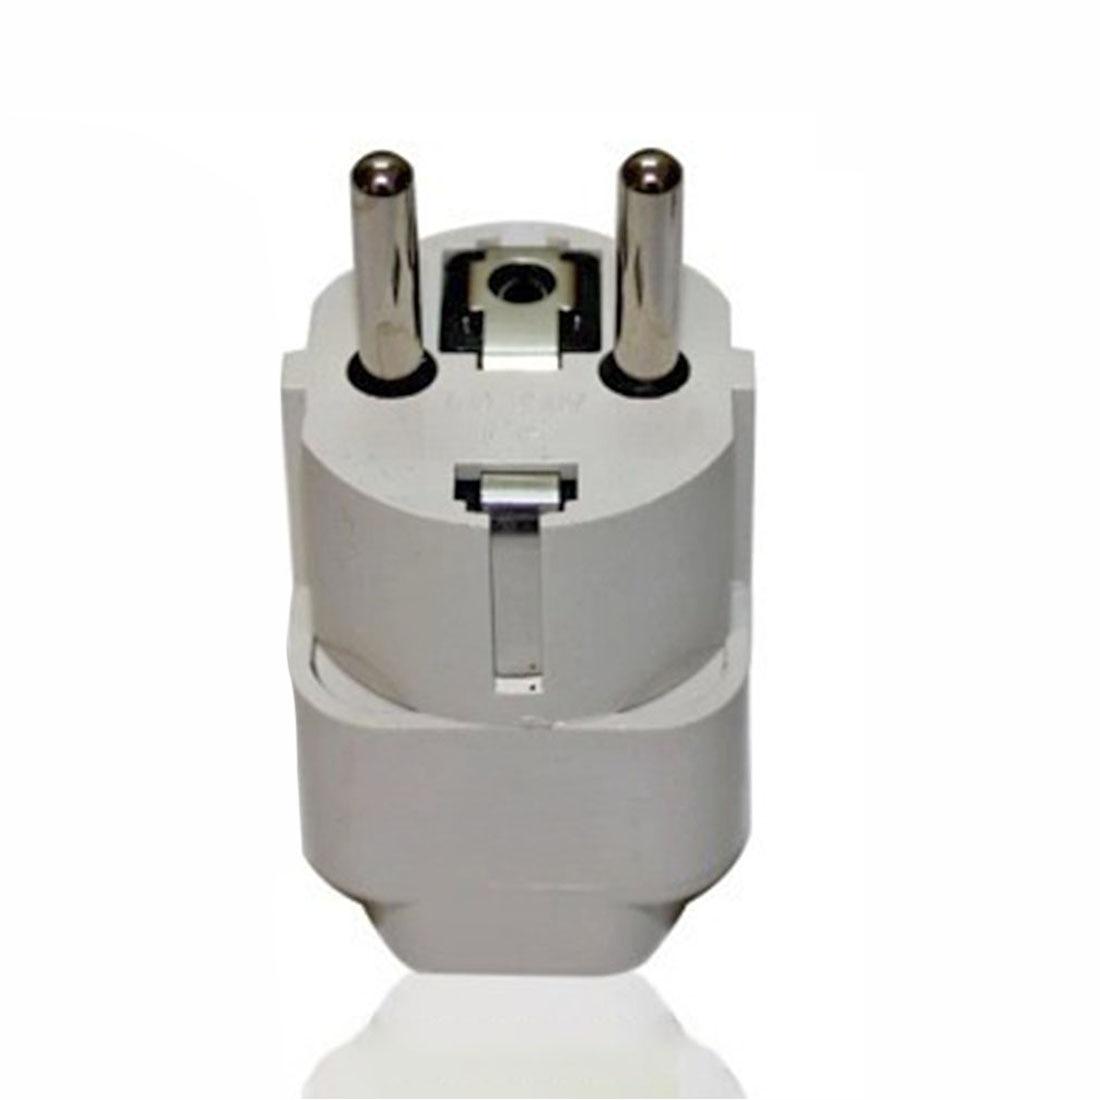 Universal EU Plug Converter Adapter (For Countries With EU Plug/US Plug)